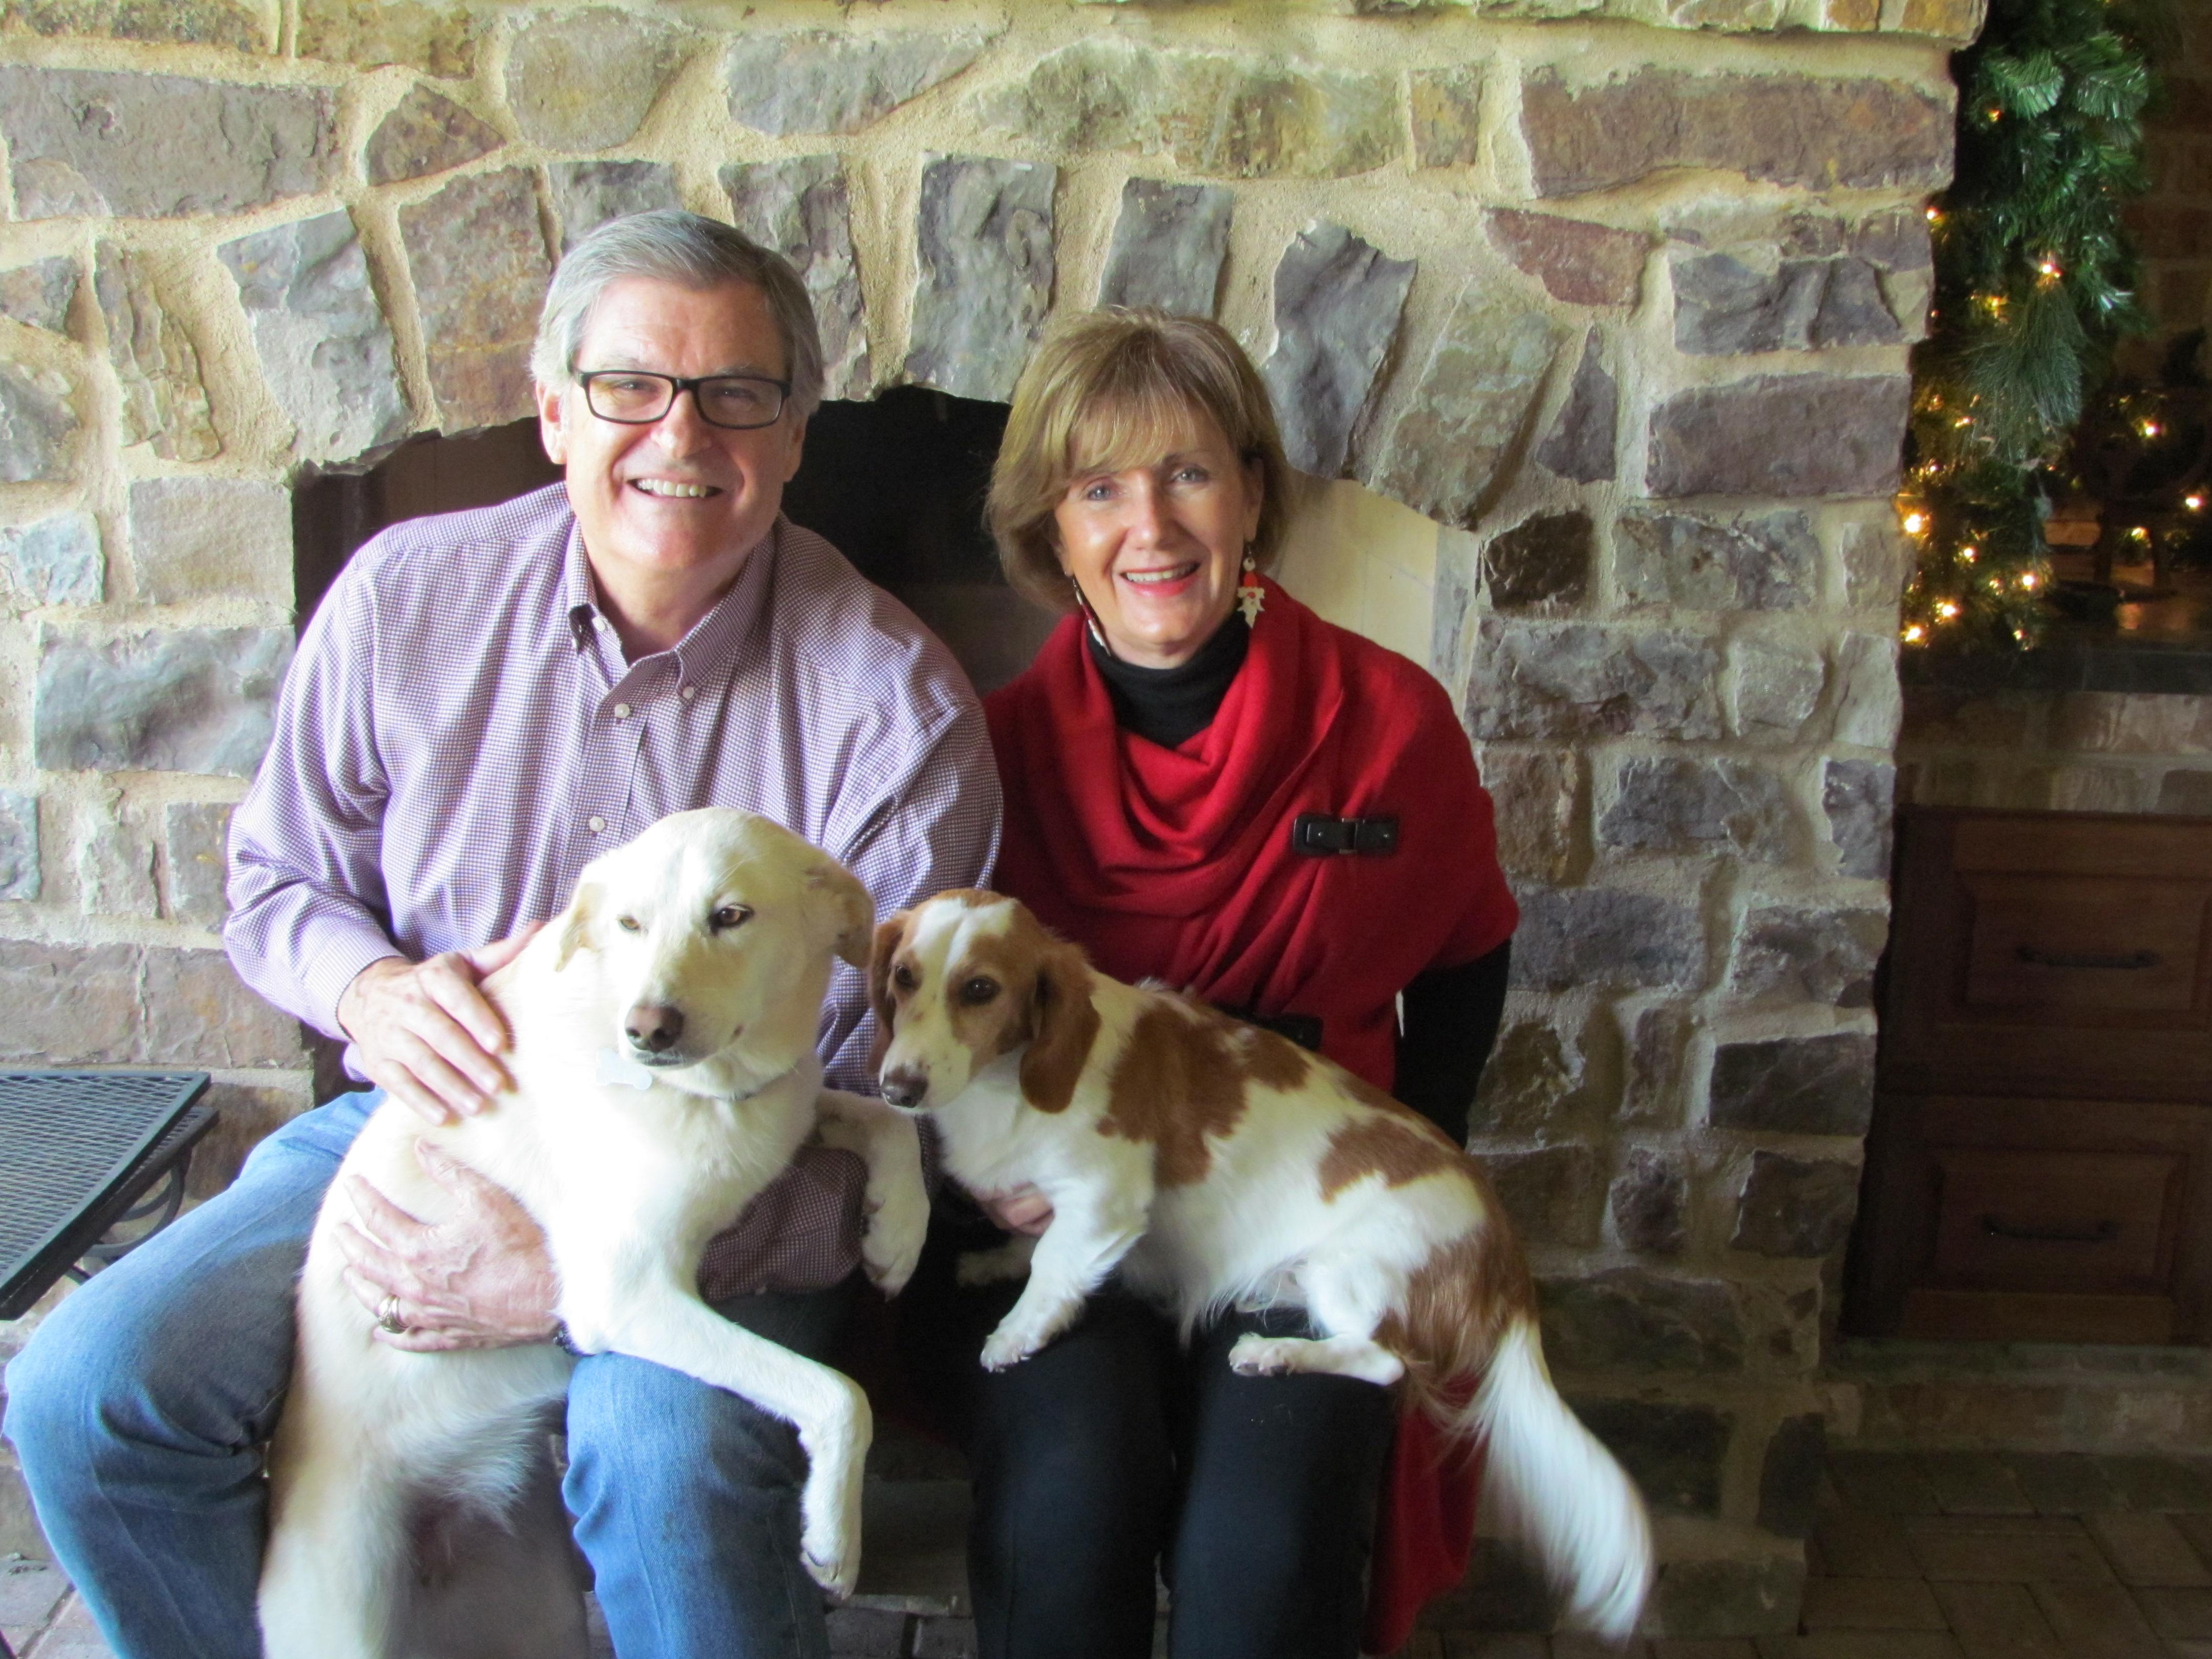 Phyllis and Lane Keller enjoying the holidays